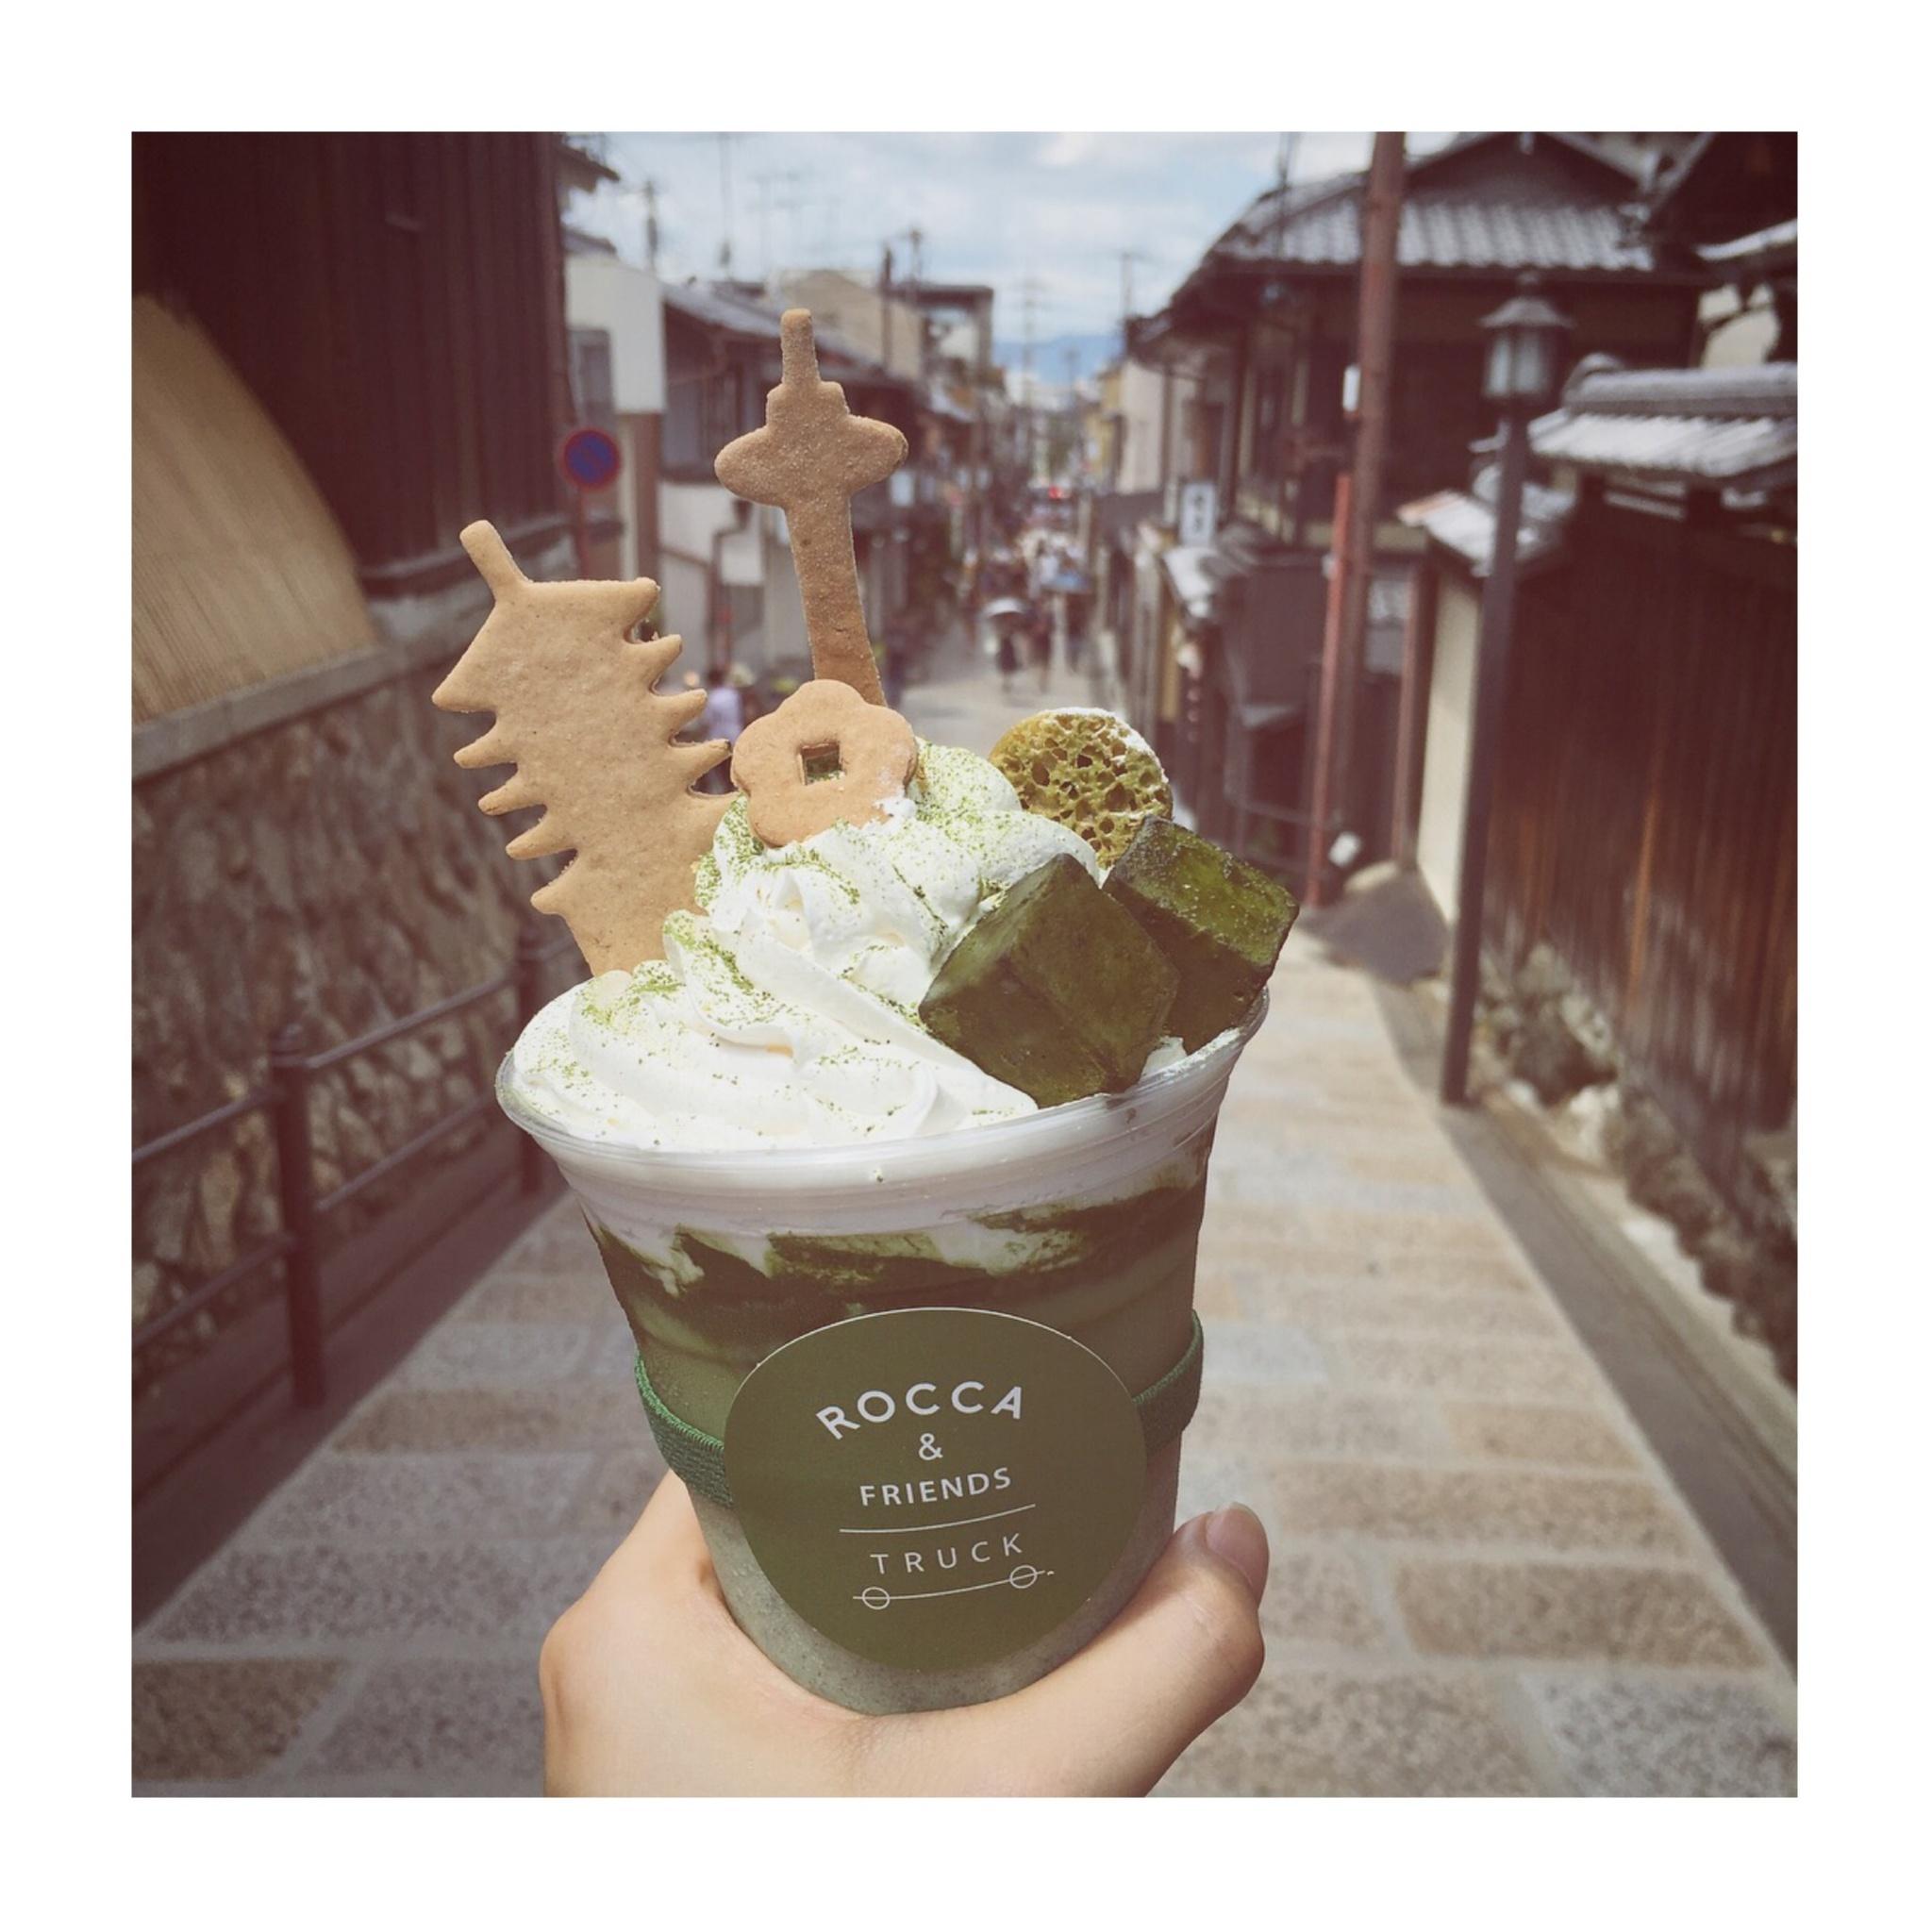 #5【#cafestagram】❤️:《京都》に行ったら絶対飲みたい!ROCCA&FRIENDS TRUCKの抹茶ラテがかわいすぎる◡̈_4